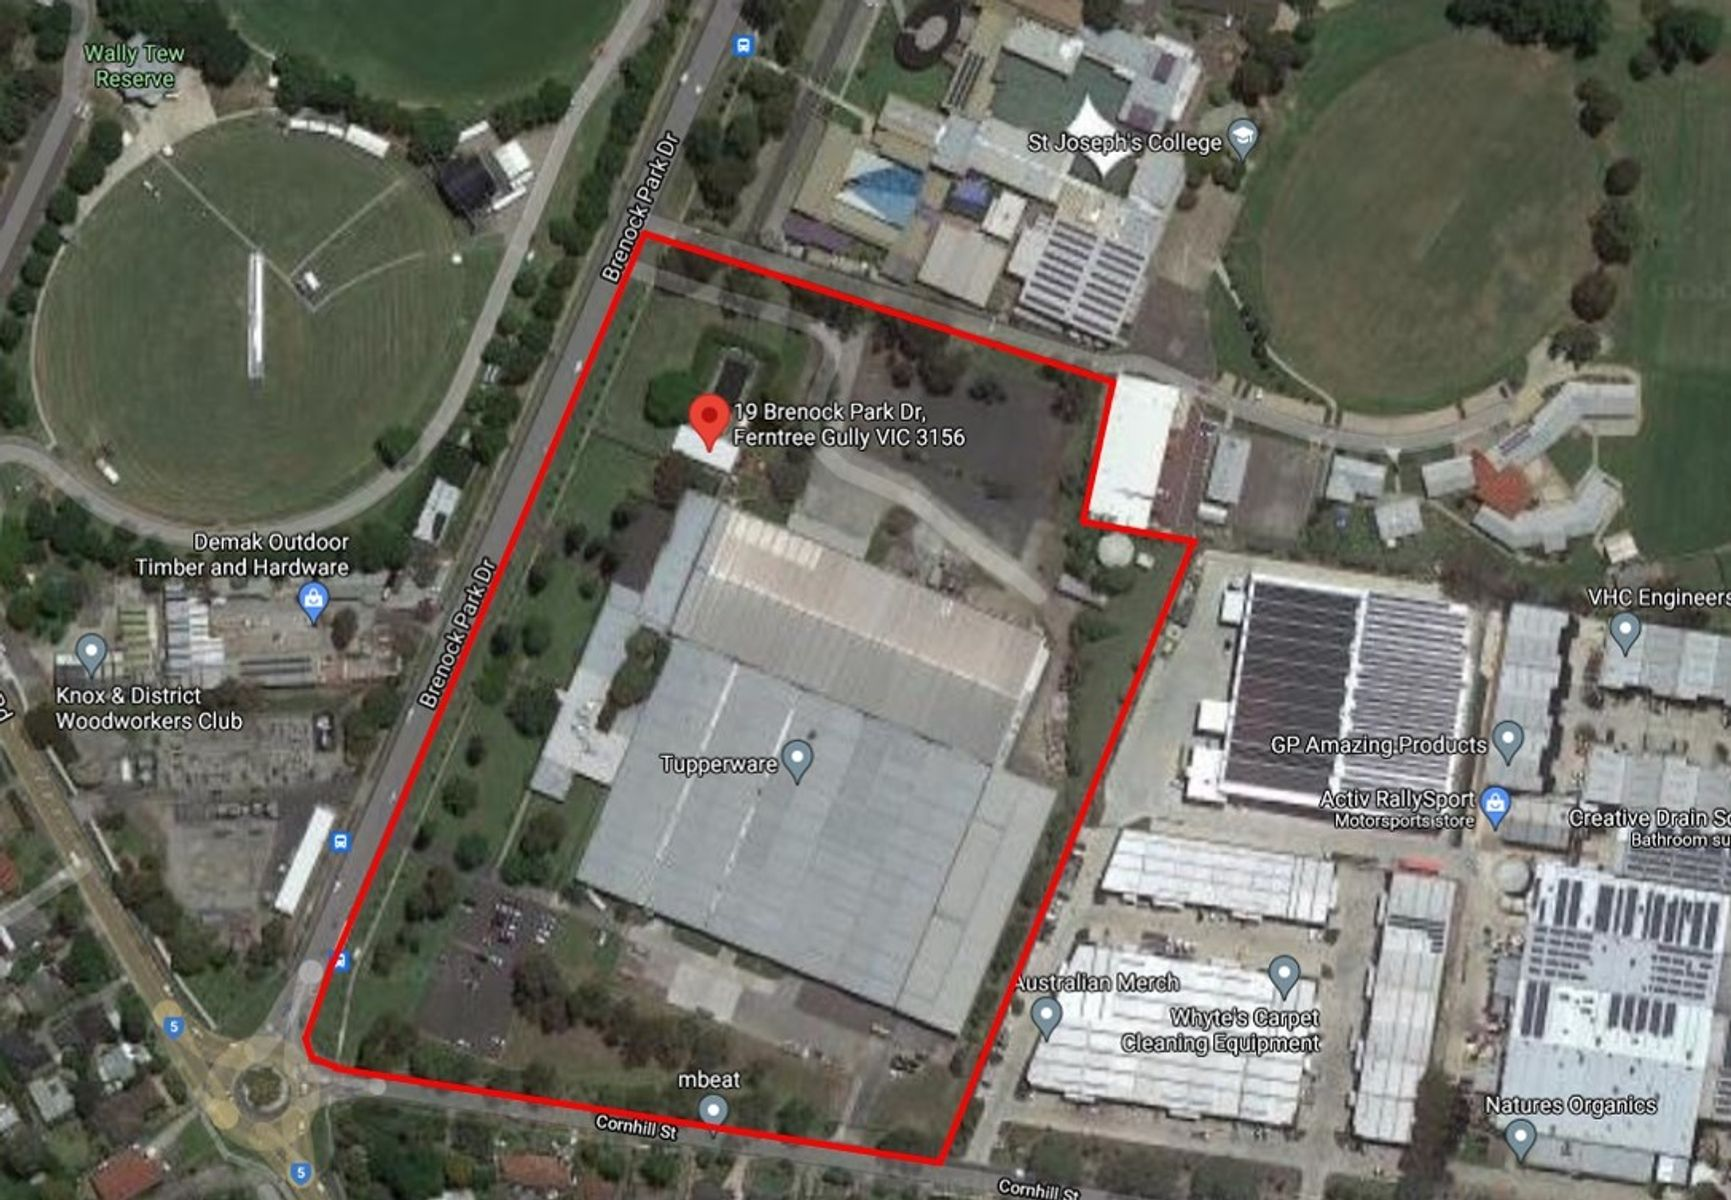 19-21 Brenock Park Drive, Ferntree Gully, VIC 3156